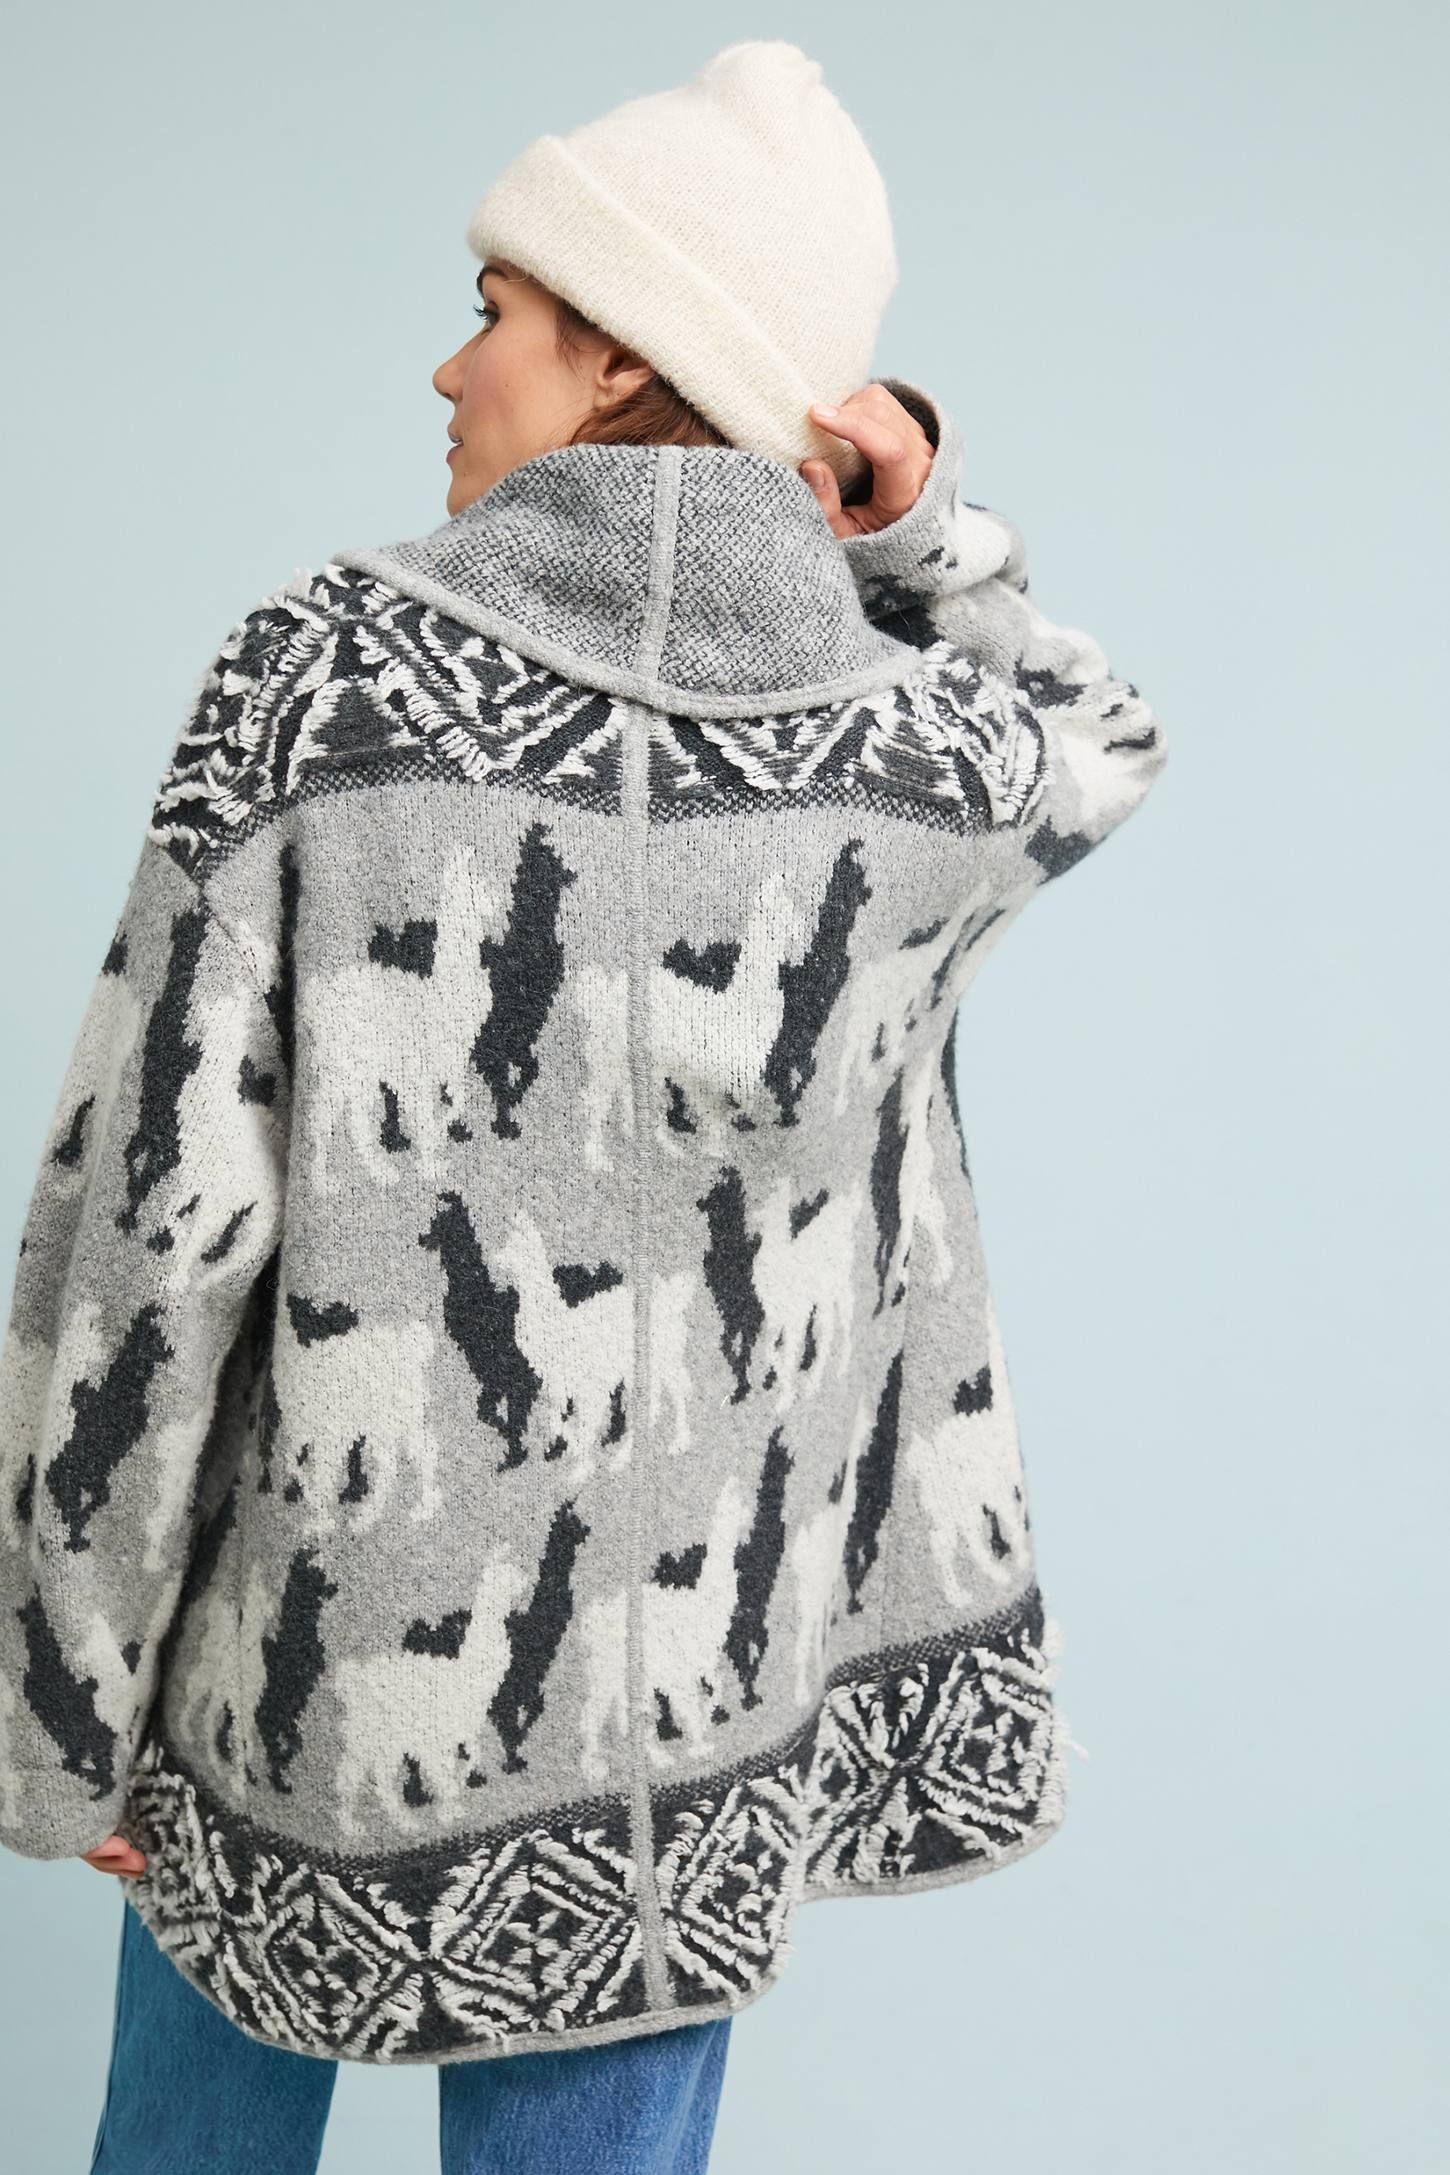 9d8f99e106 Llama Knit Cardigan